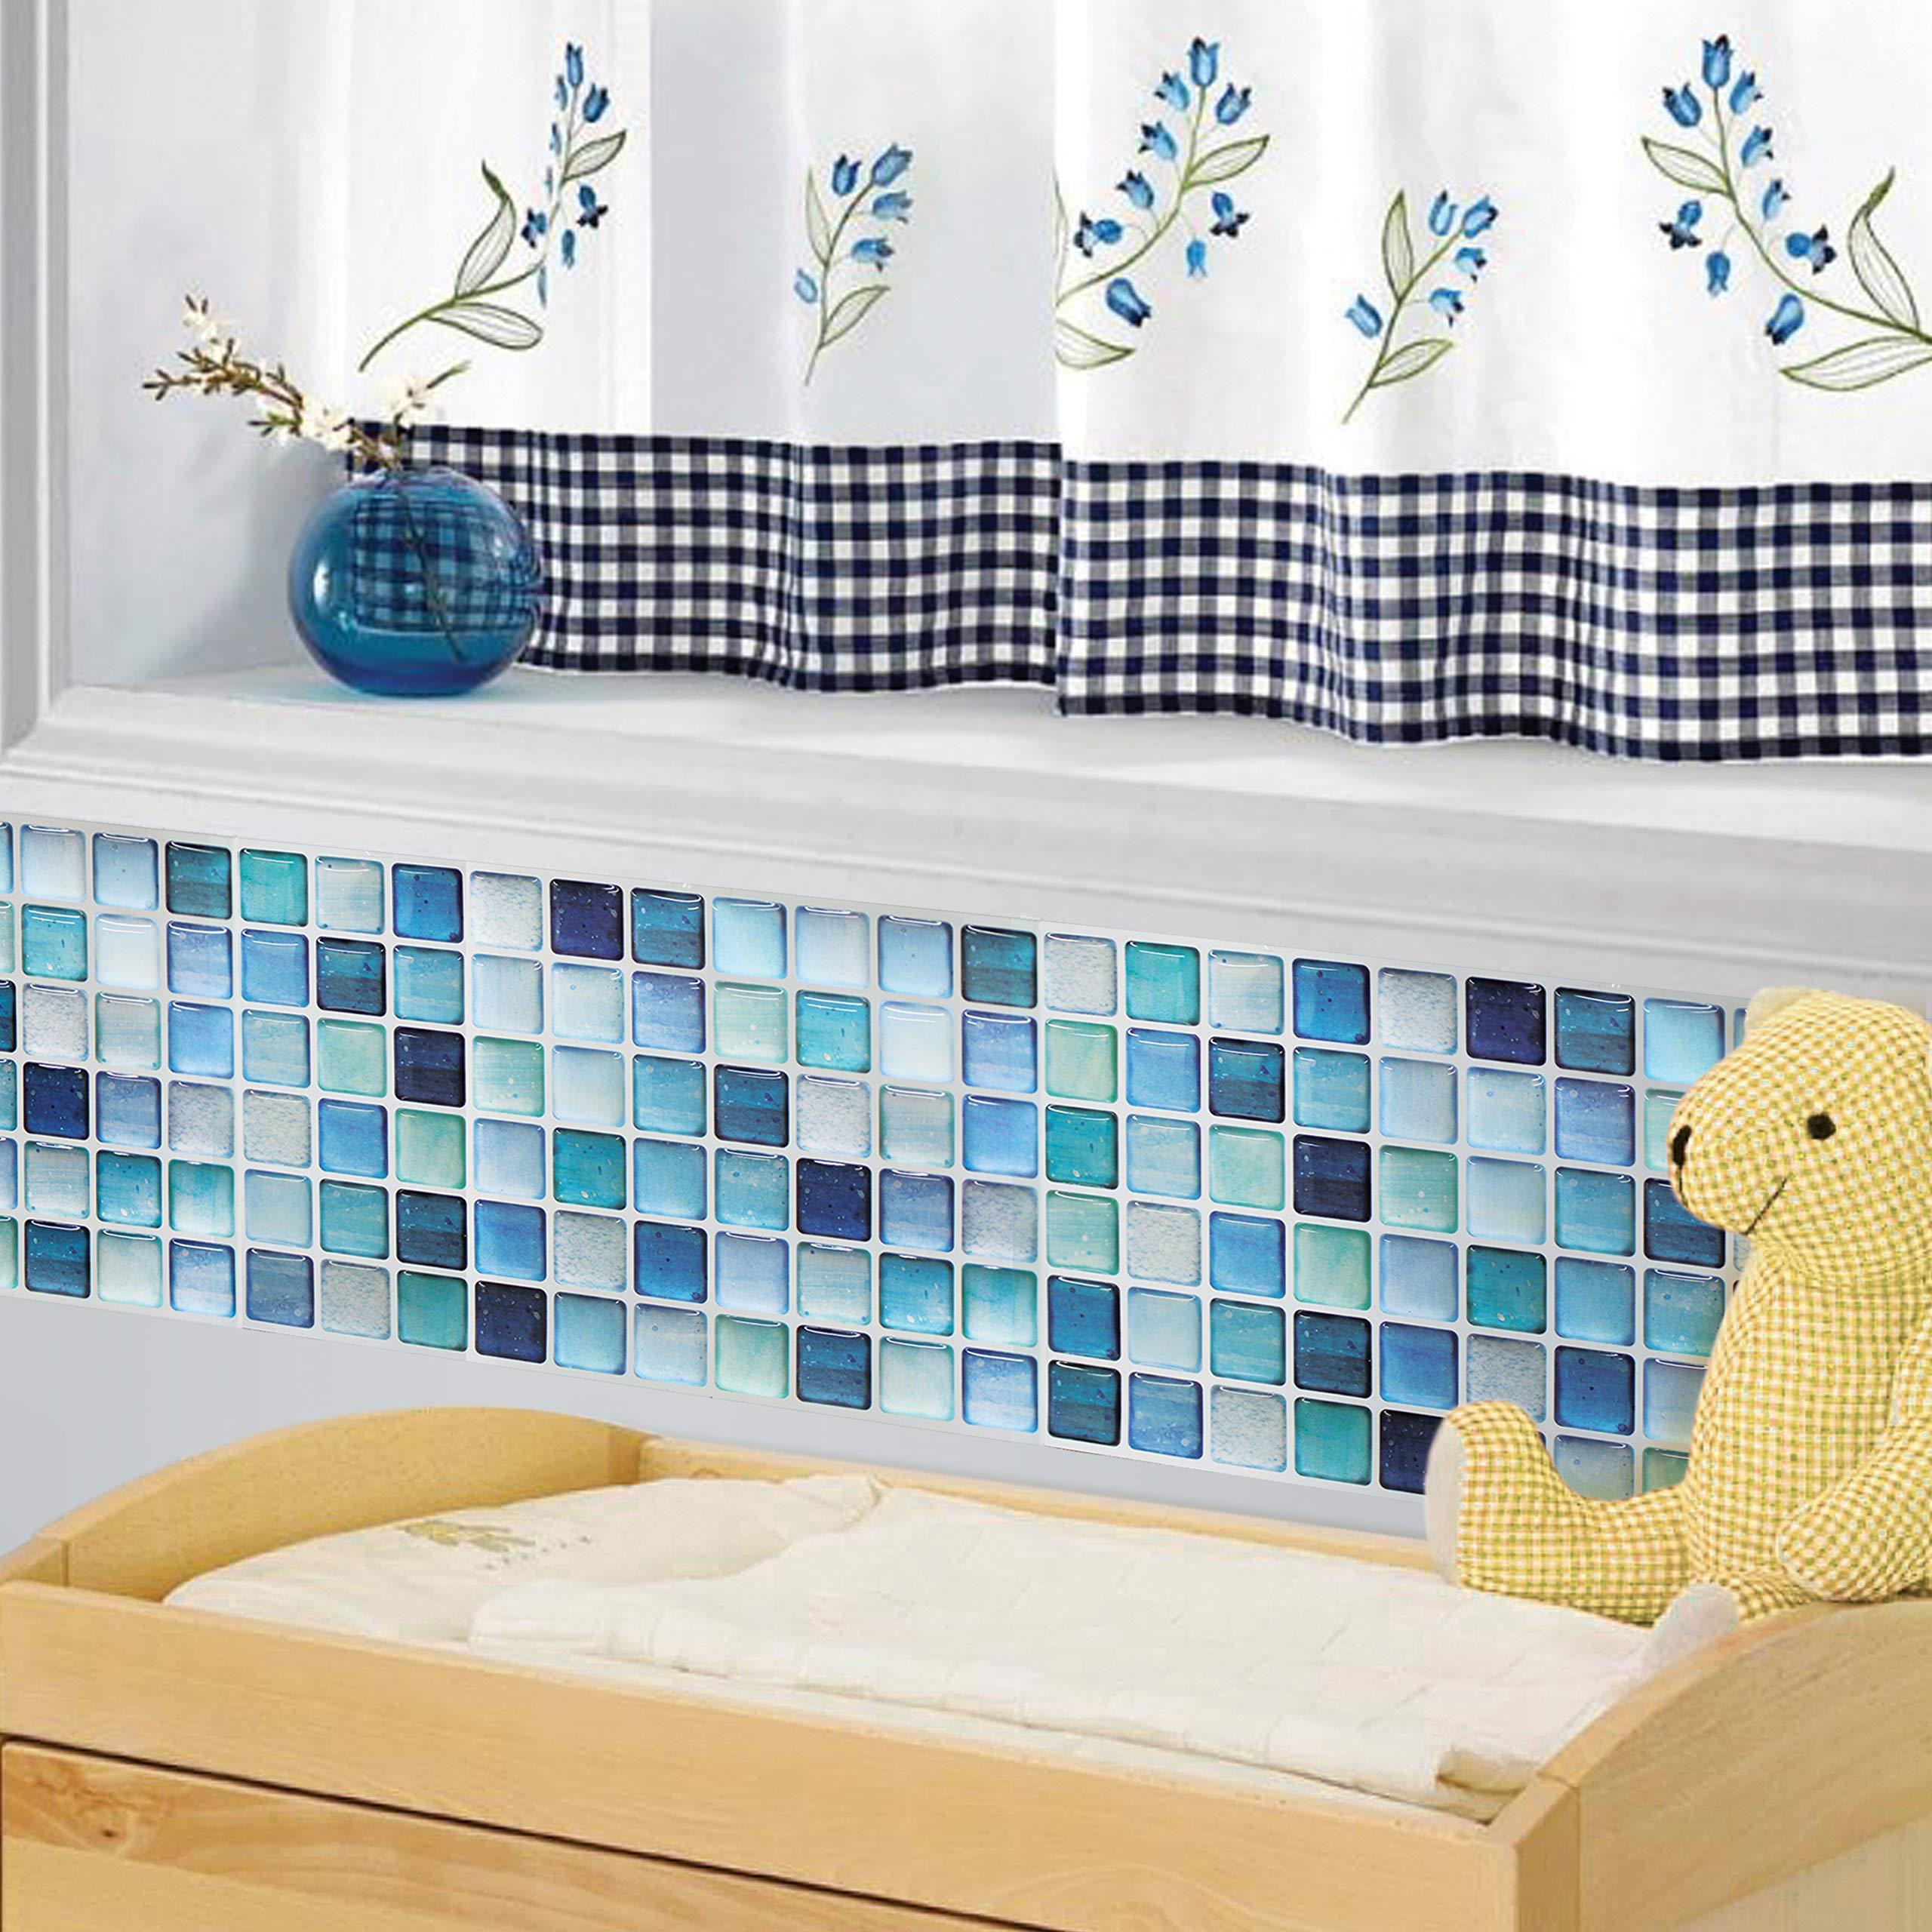 BEAUSTILE Decorative Tile Stickers Peel and Stick Backsplash Fire Retardant Tile Sheet (N.Blue) (10, 5.28'' x 14.8'') by BEAUS TILE (Image #8)